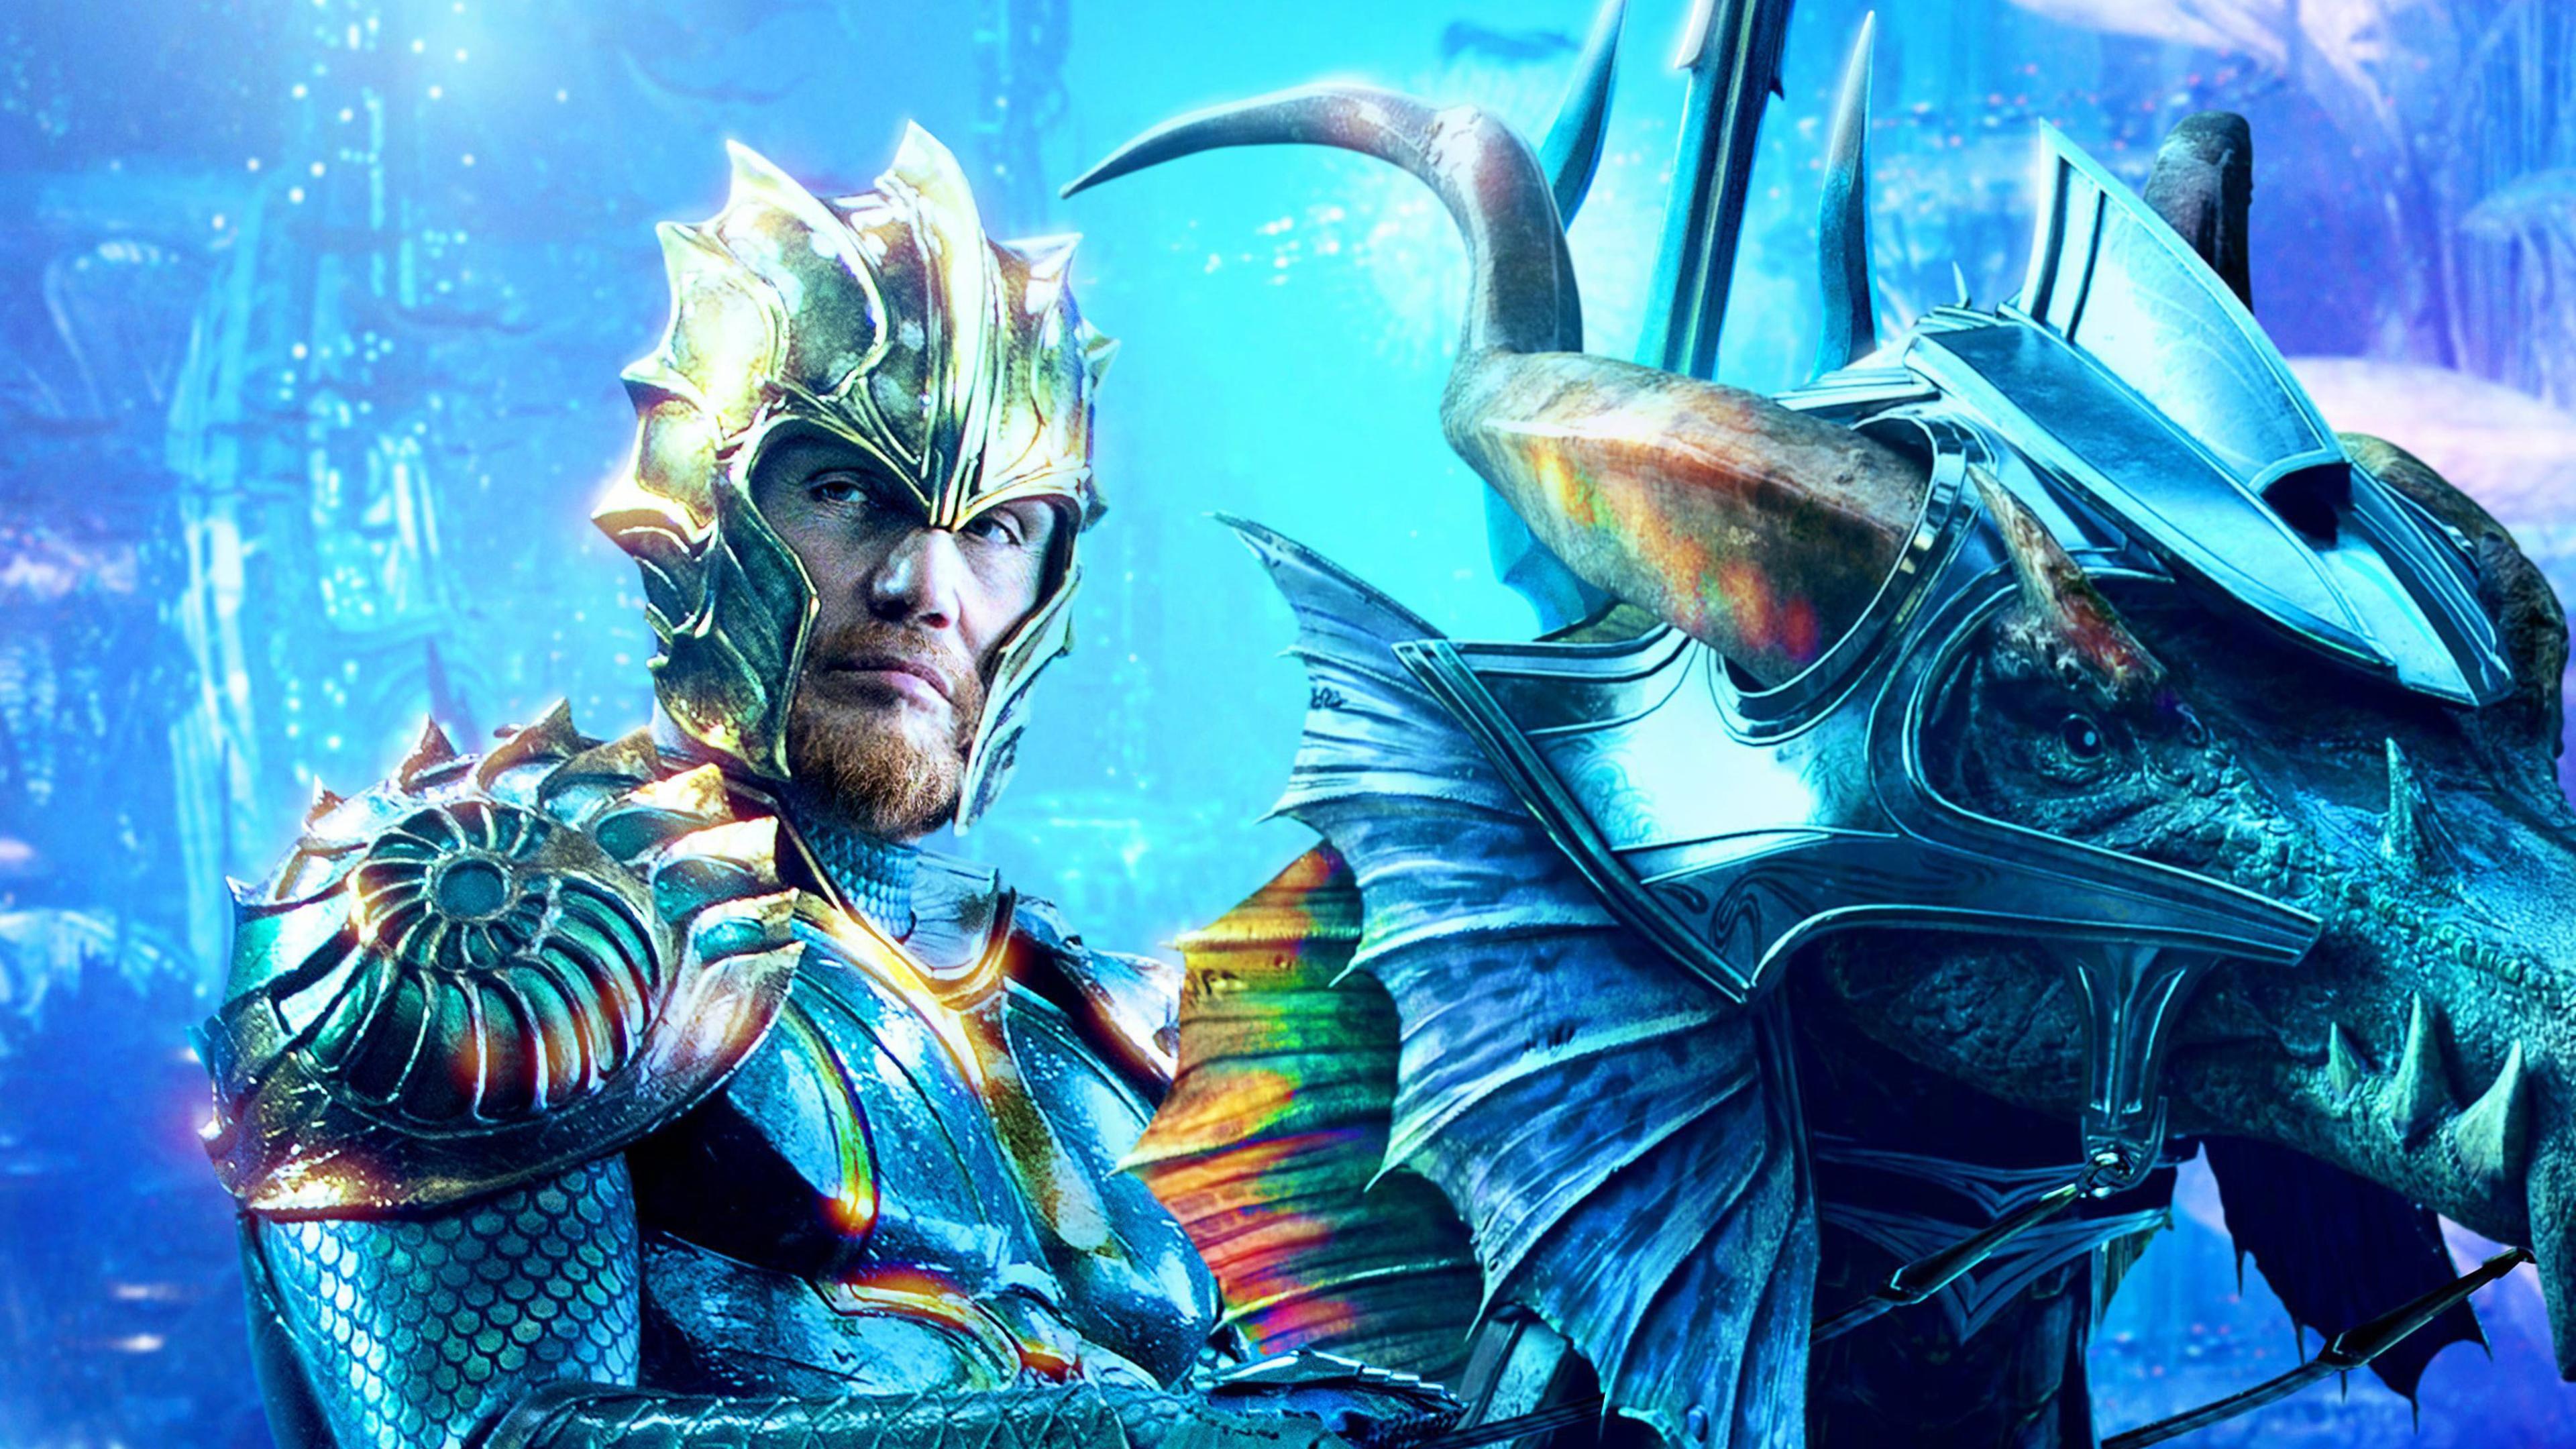 aquaman king nereus 3c 3840x2160 - Aquaman king Nereus - aquaman movie wallpapers 4k, Aquaman king Nereus wallpapers, Aquaman king Nereus 4k wallpapers